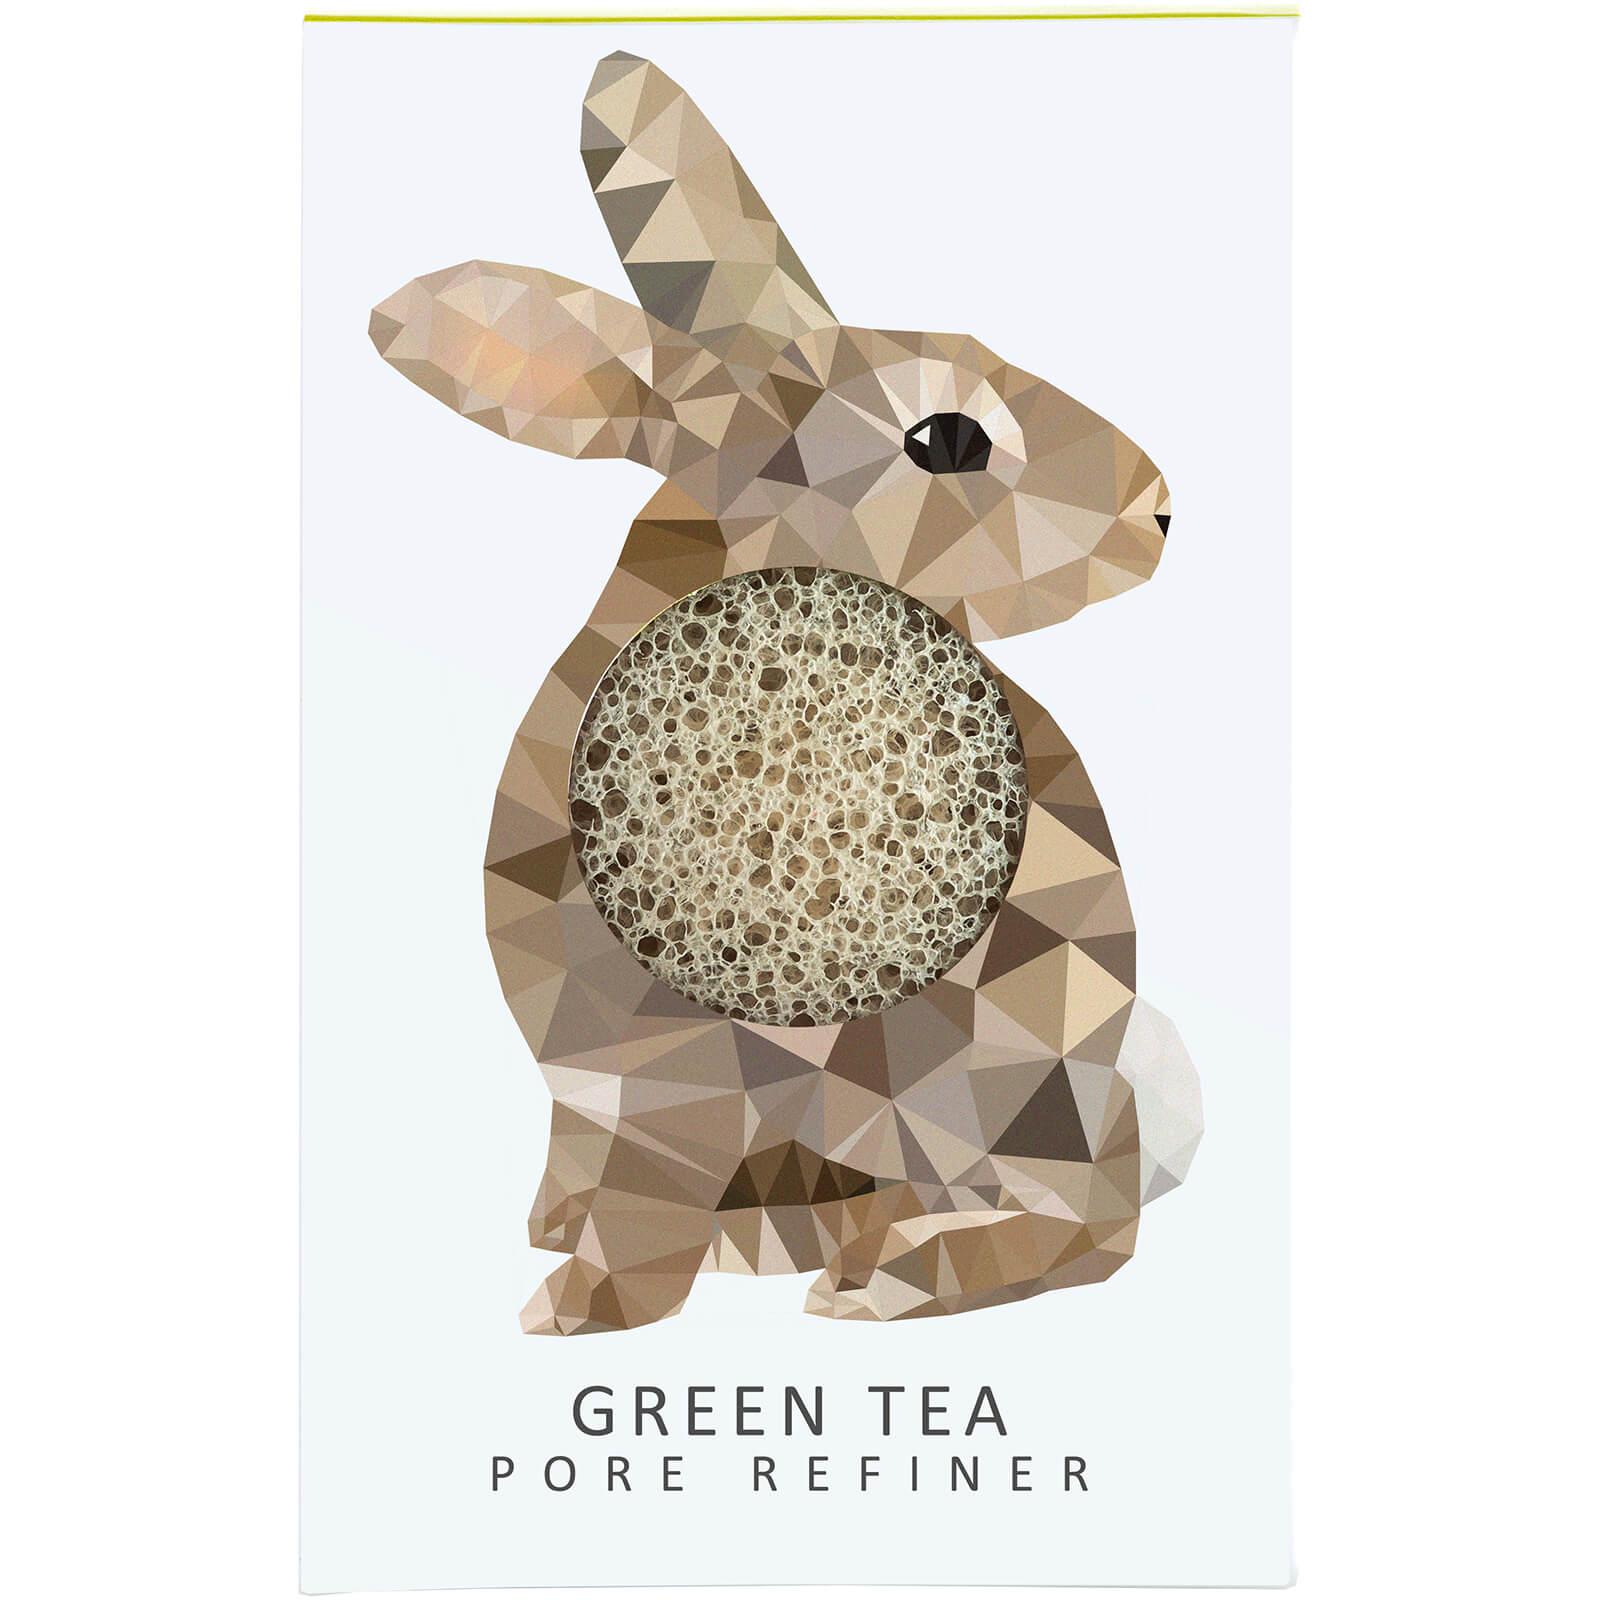 Купить Мини-спонж для лица The Konjac Sponge Company Woodland Rabbit Pure Konjac Mini Pore Refiner — Green Tea 12 г